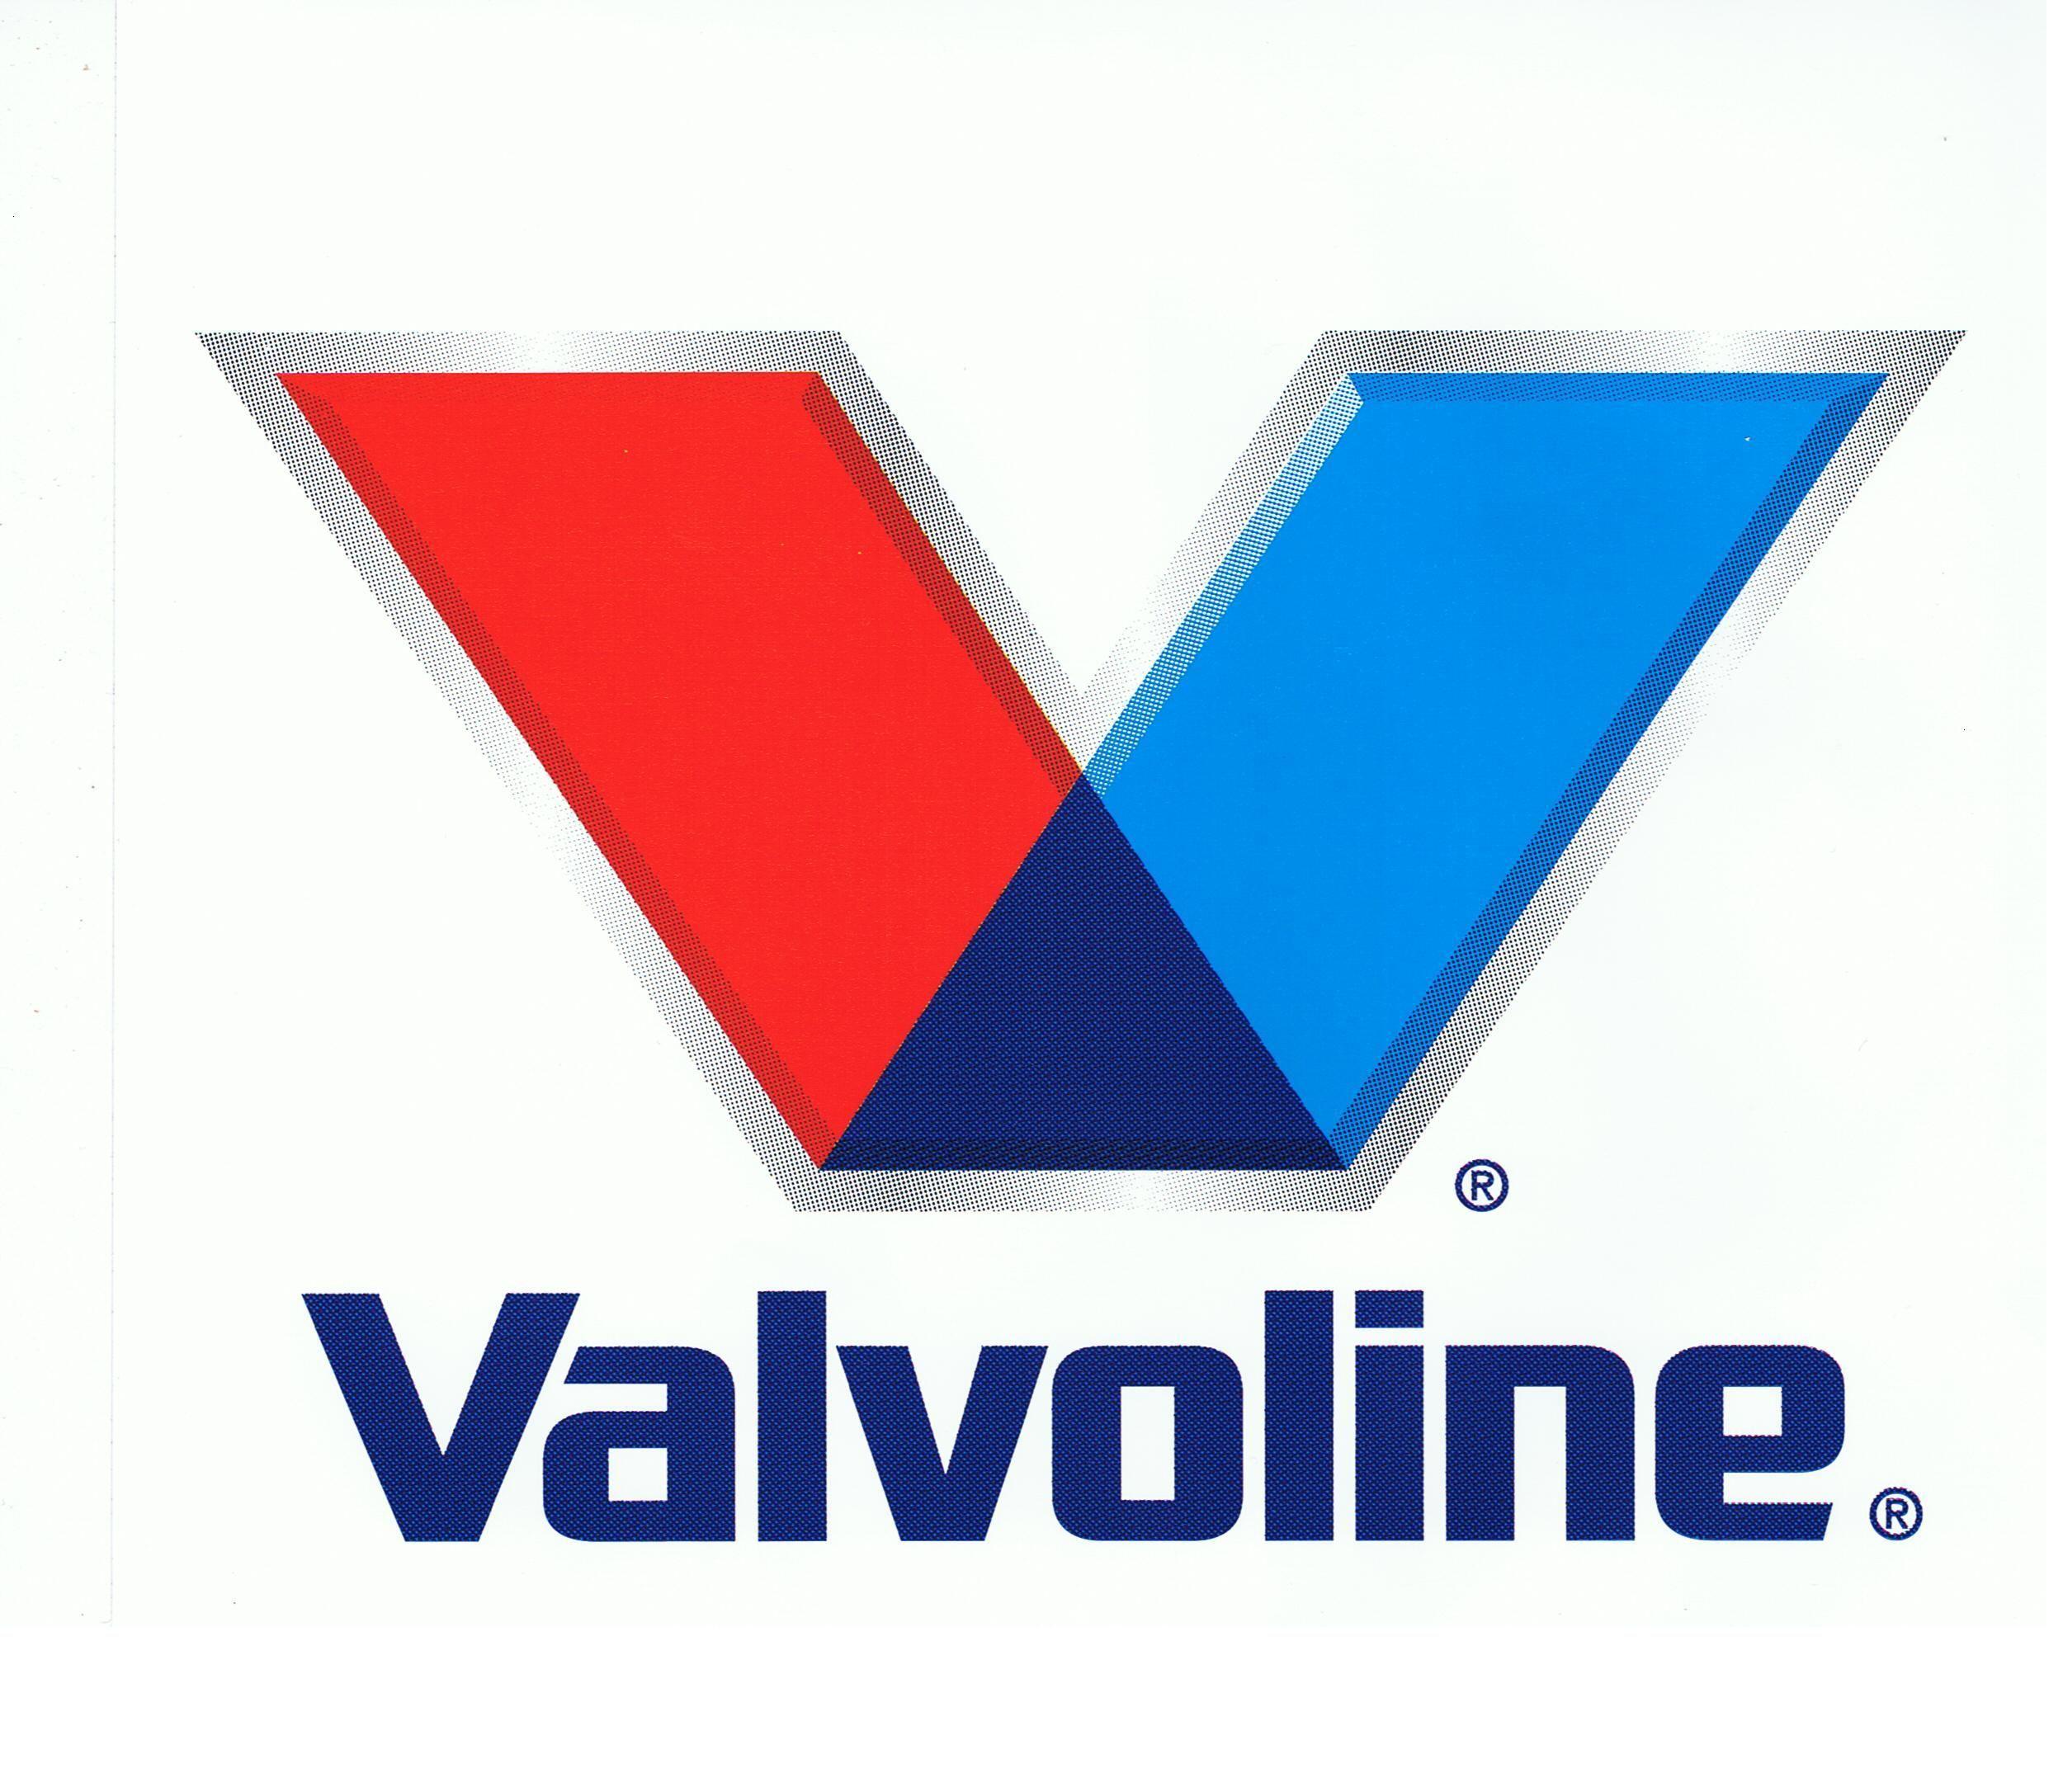 valvoline   Google Search Car related logos Best logo design 2500x2172